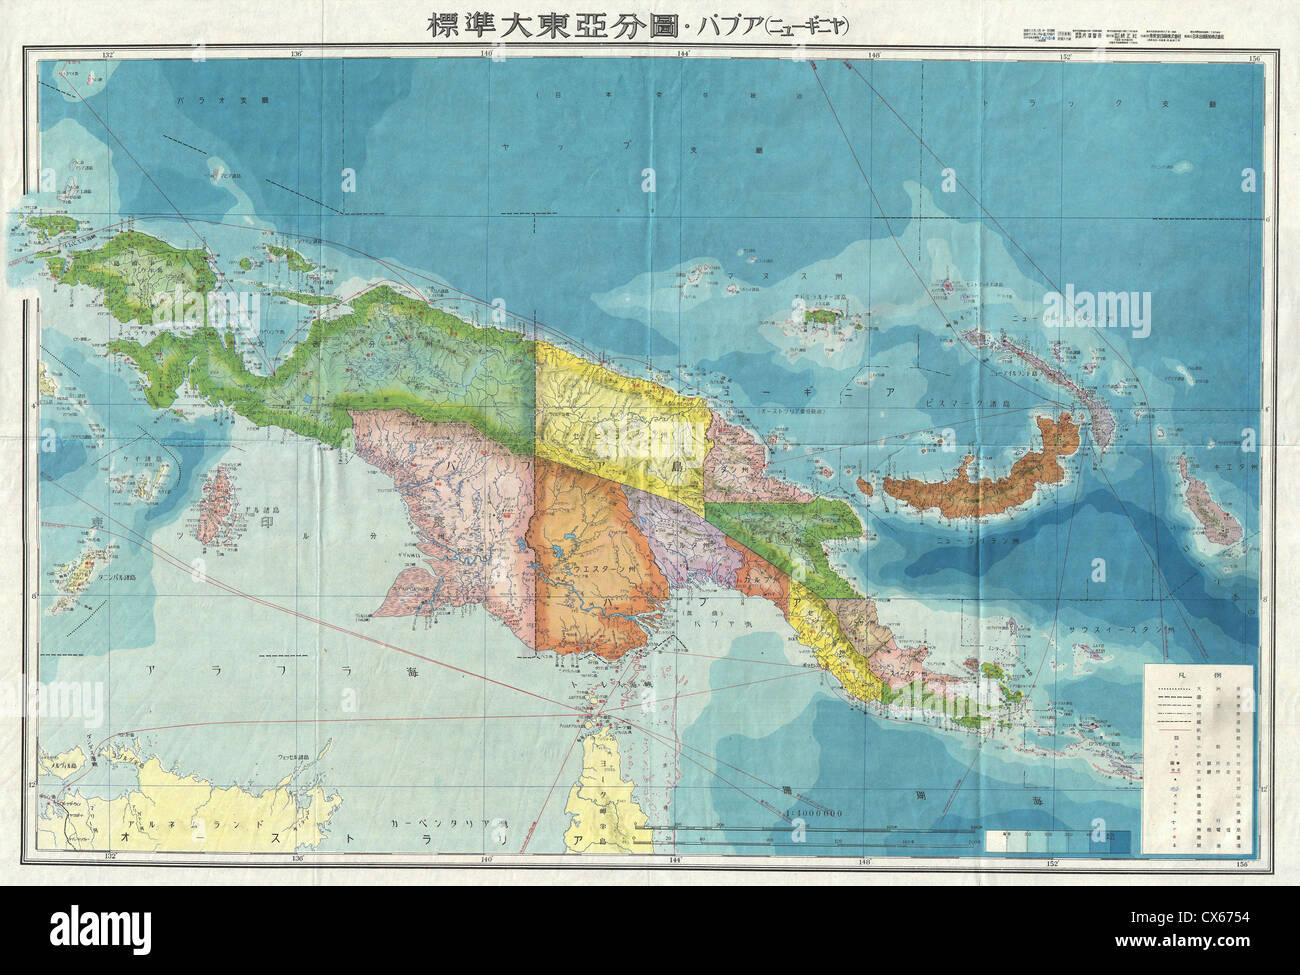 1943 world war ii japanese aeronautical map of new guinea stock 1943 world war ii japanese aeronautical map of new guinea gumiabroncs Gallery